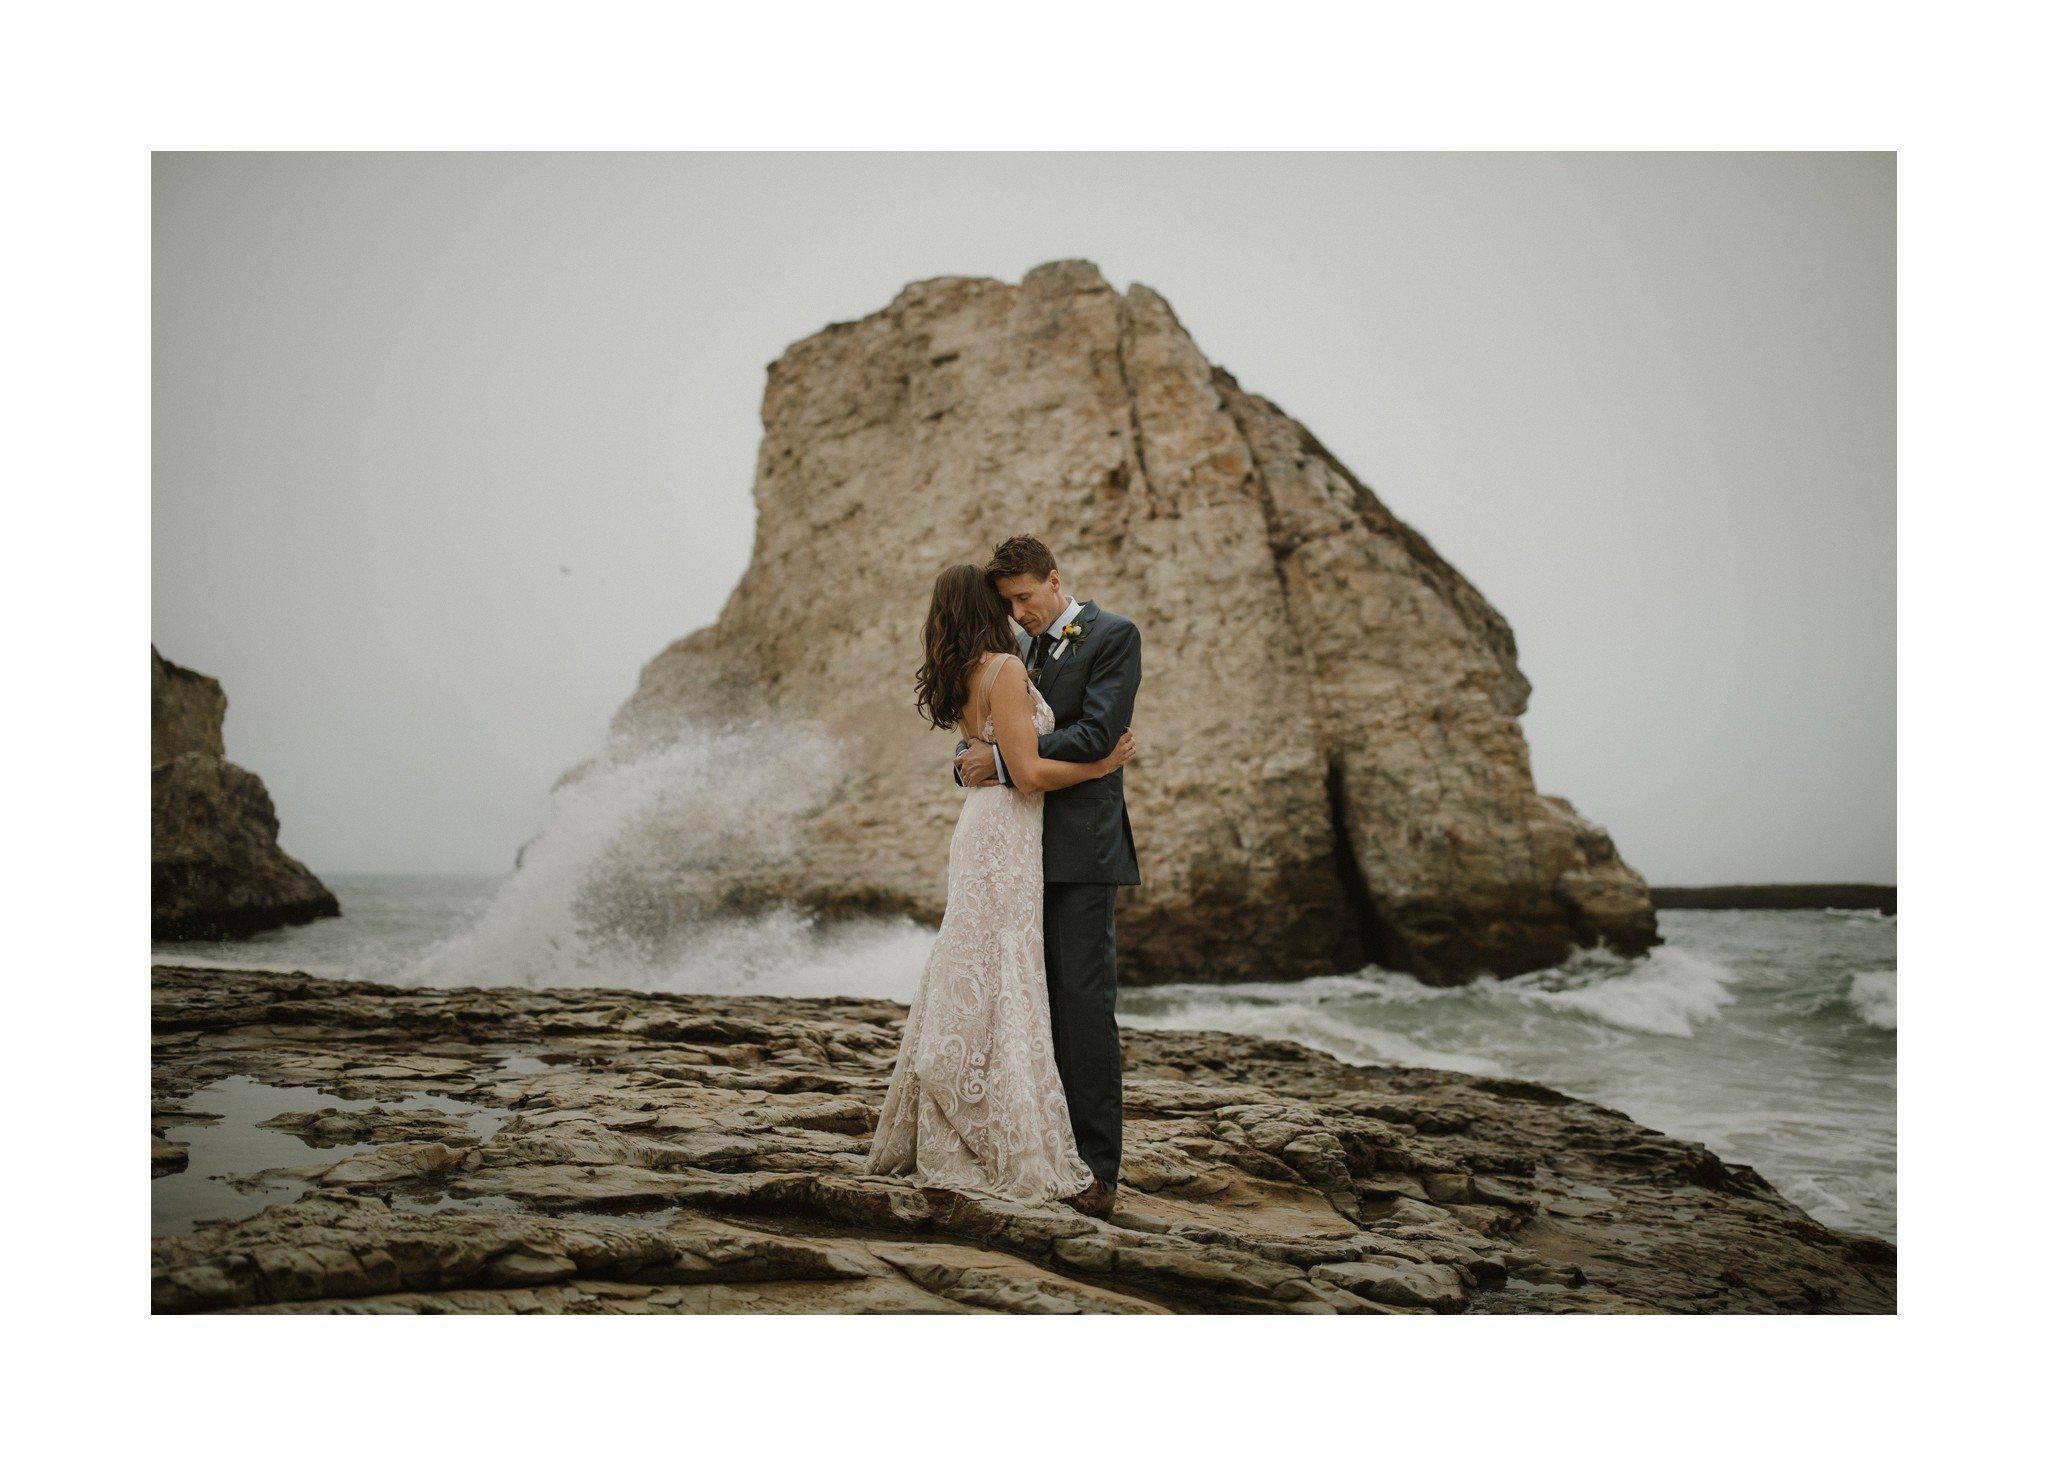 sharkfin rock wedding